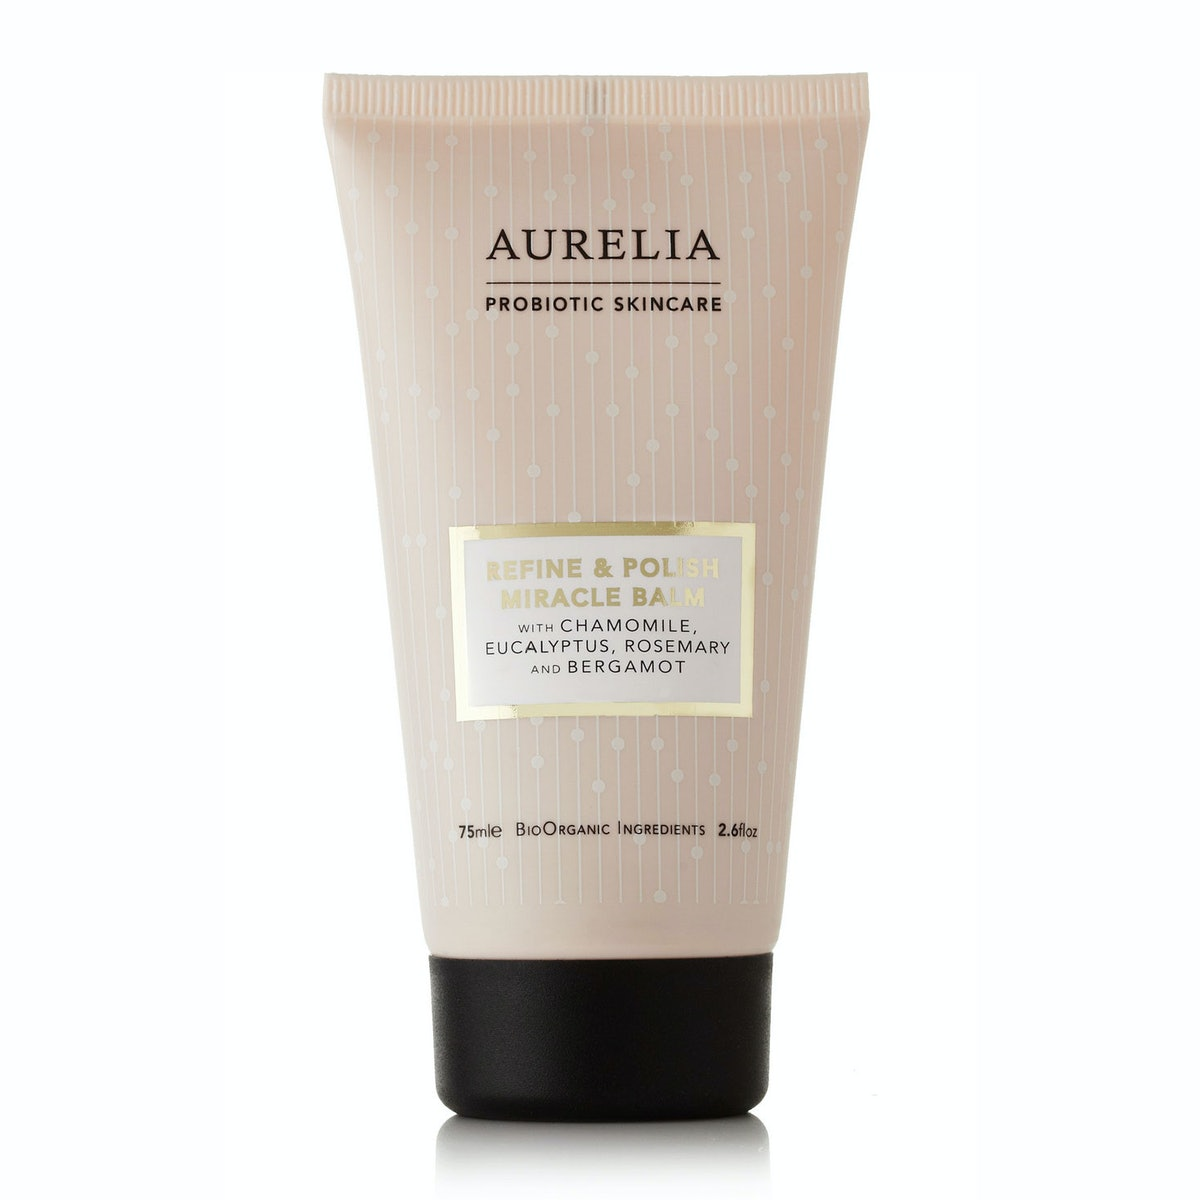 Aurelia Refine & Polish Miracle Balm